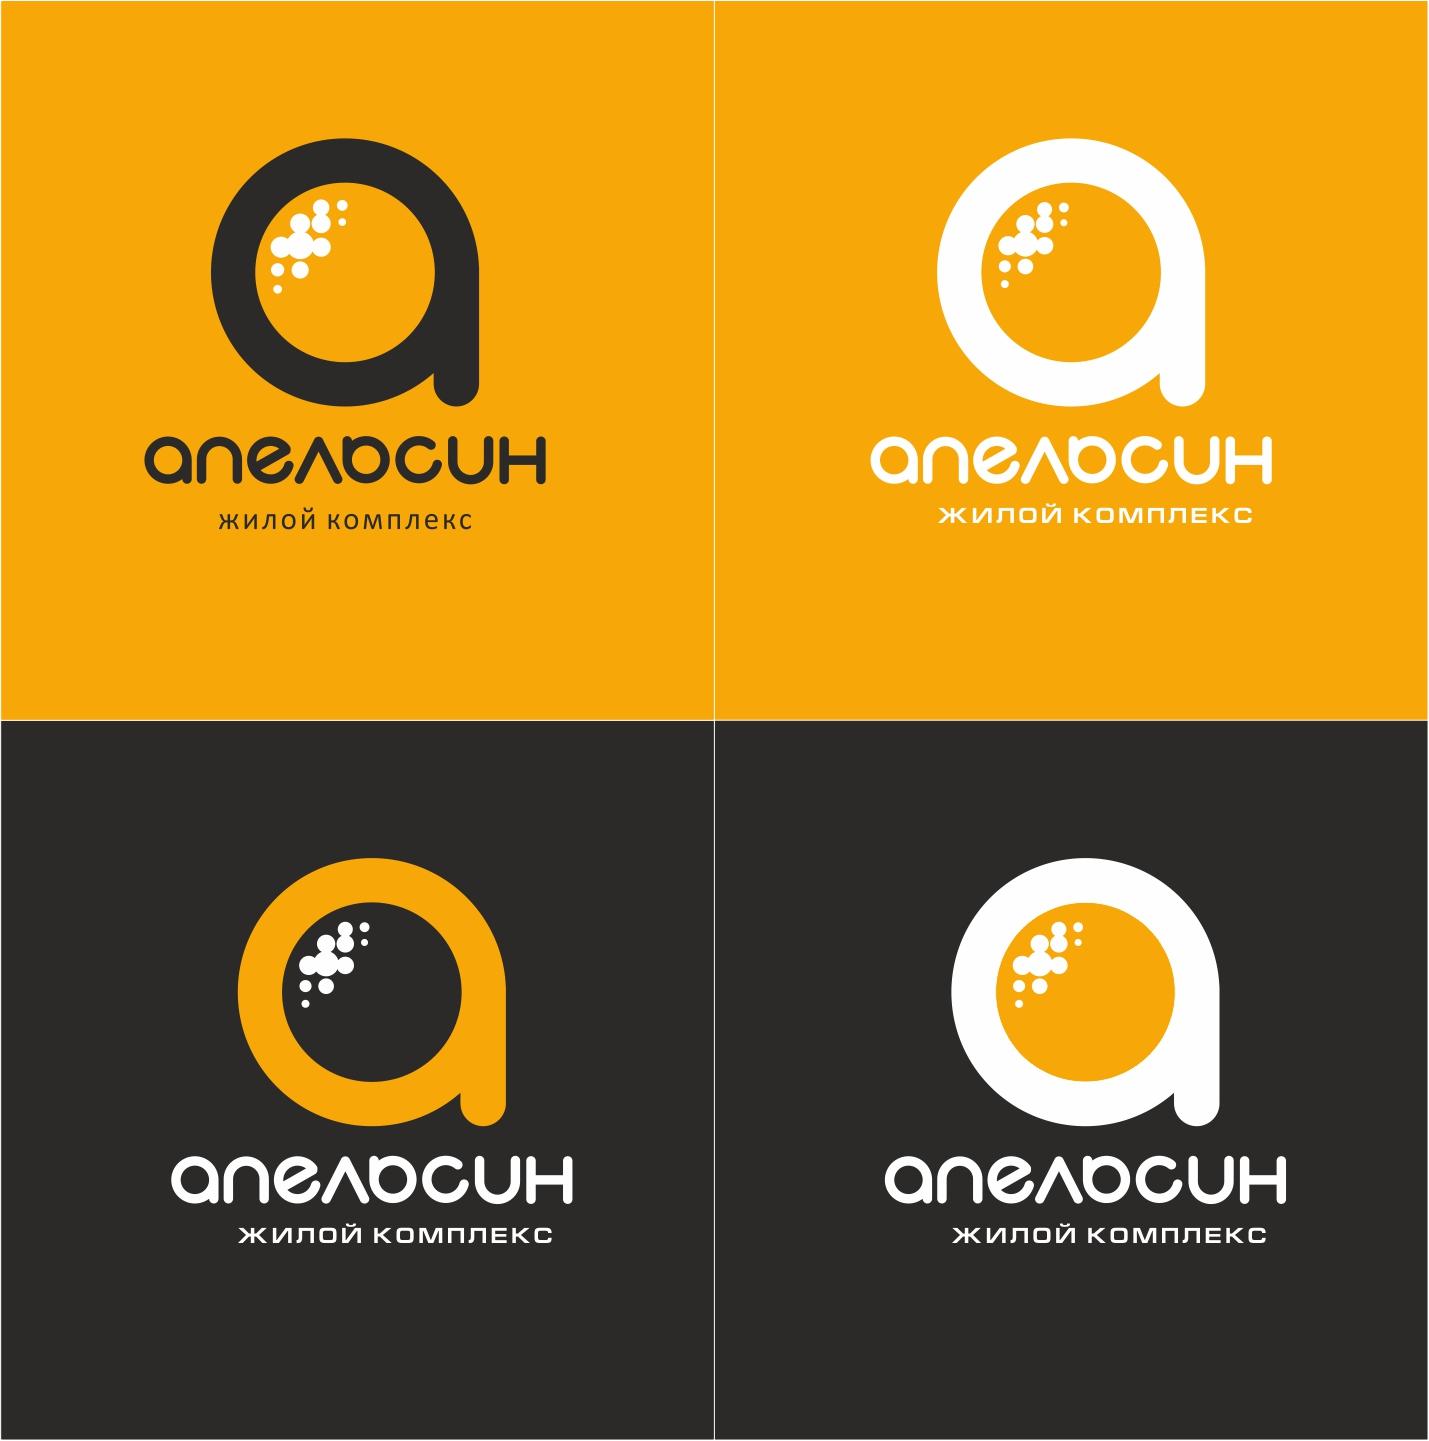 Логотип и фирменный стиль фото f_9695a719b0ae8628.jpg